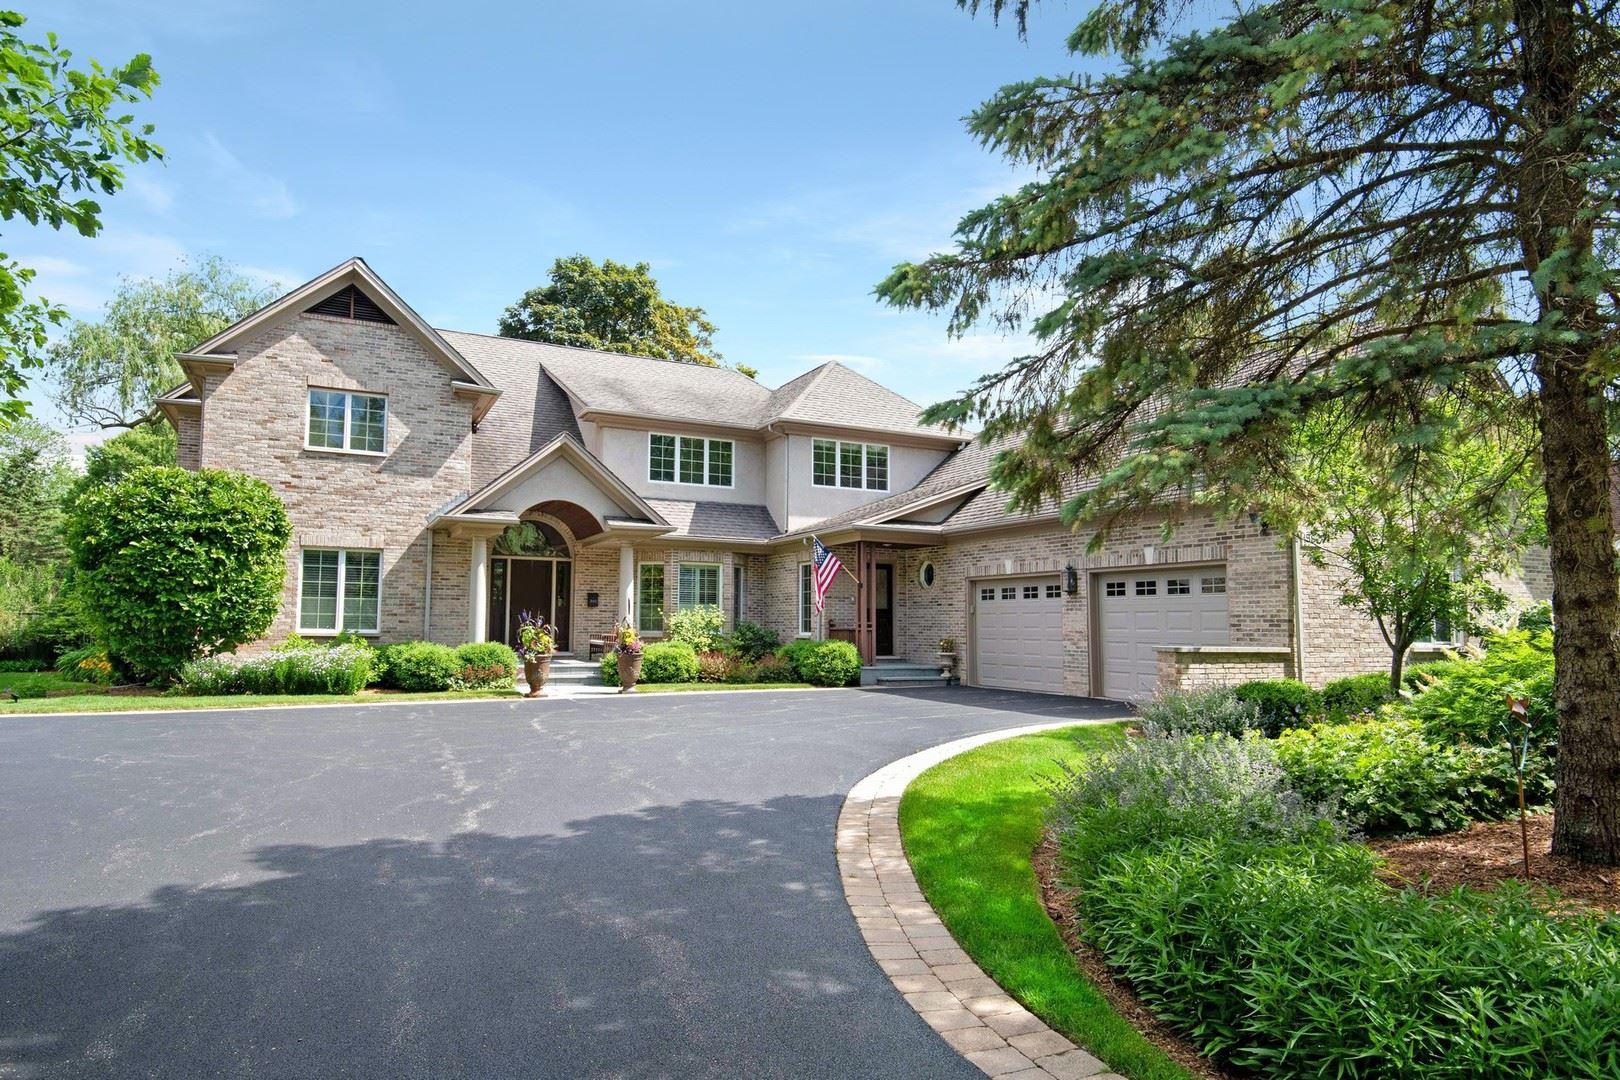 1562 WALTERS Avenue, Northbrook, IL 60062 - #: 10802841